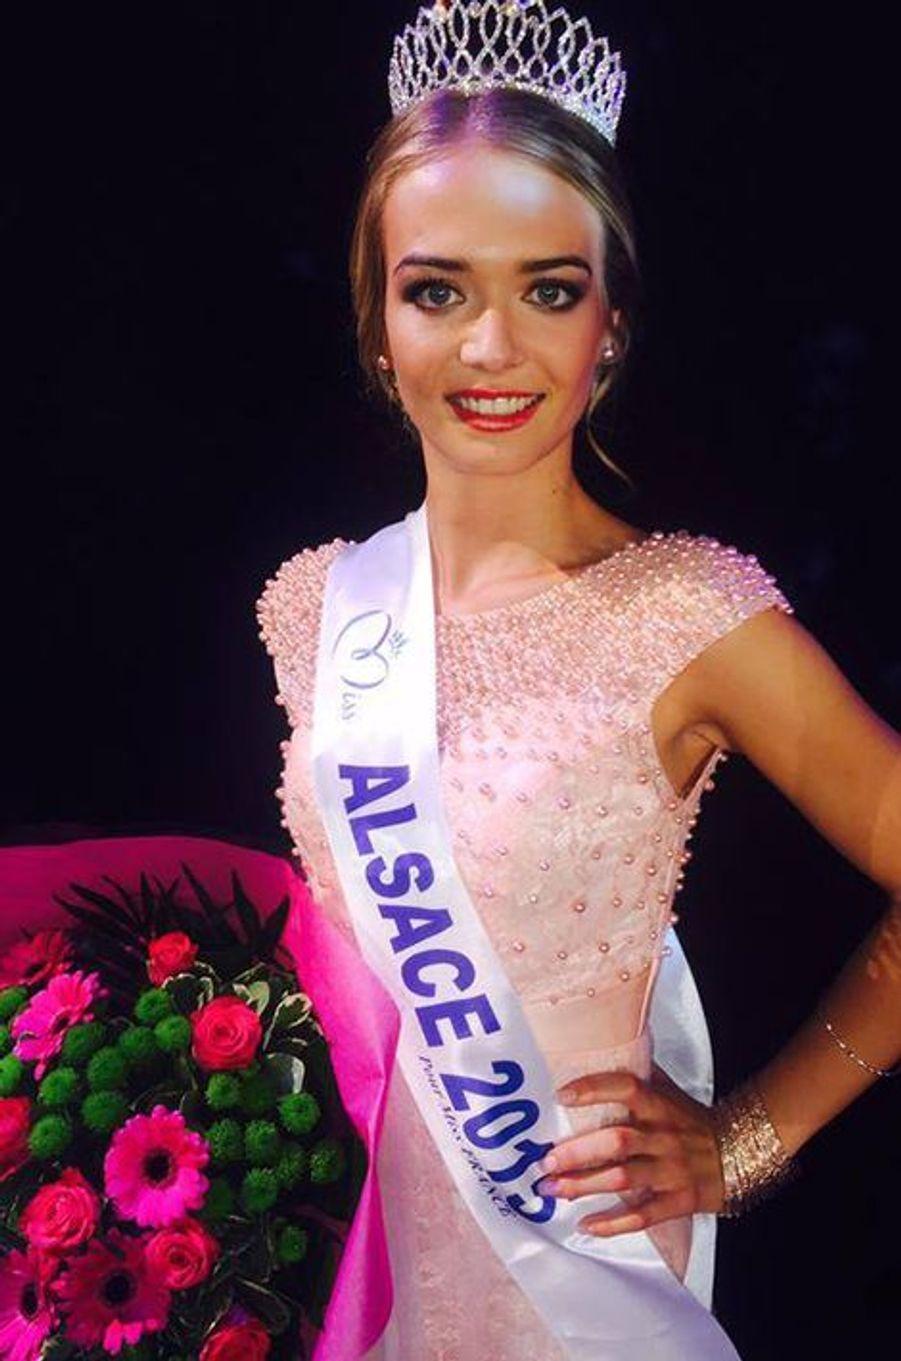 Miss Alsace - Laura Muller (19 ans - 1,71 m) - Étudiante en relations internationales